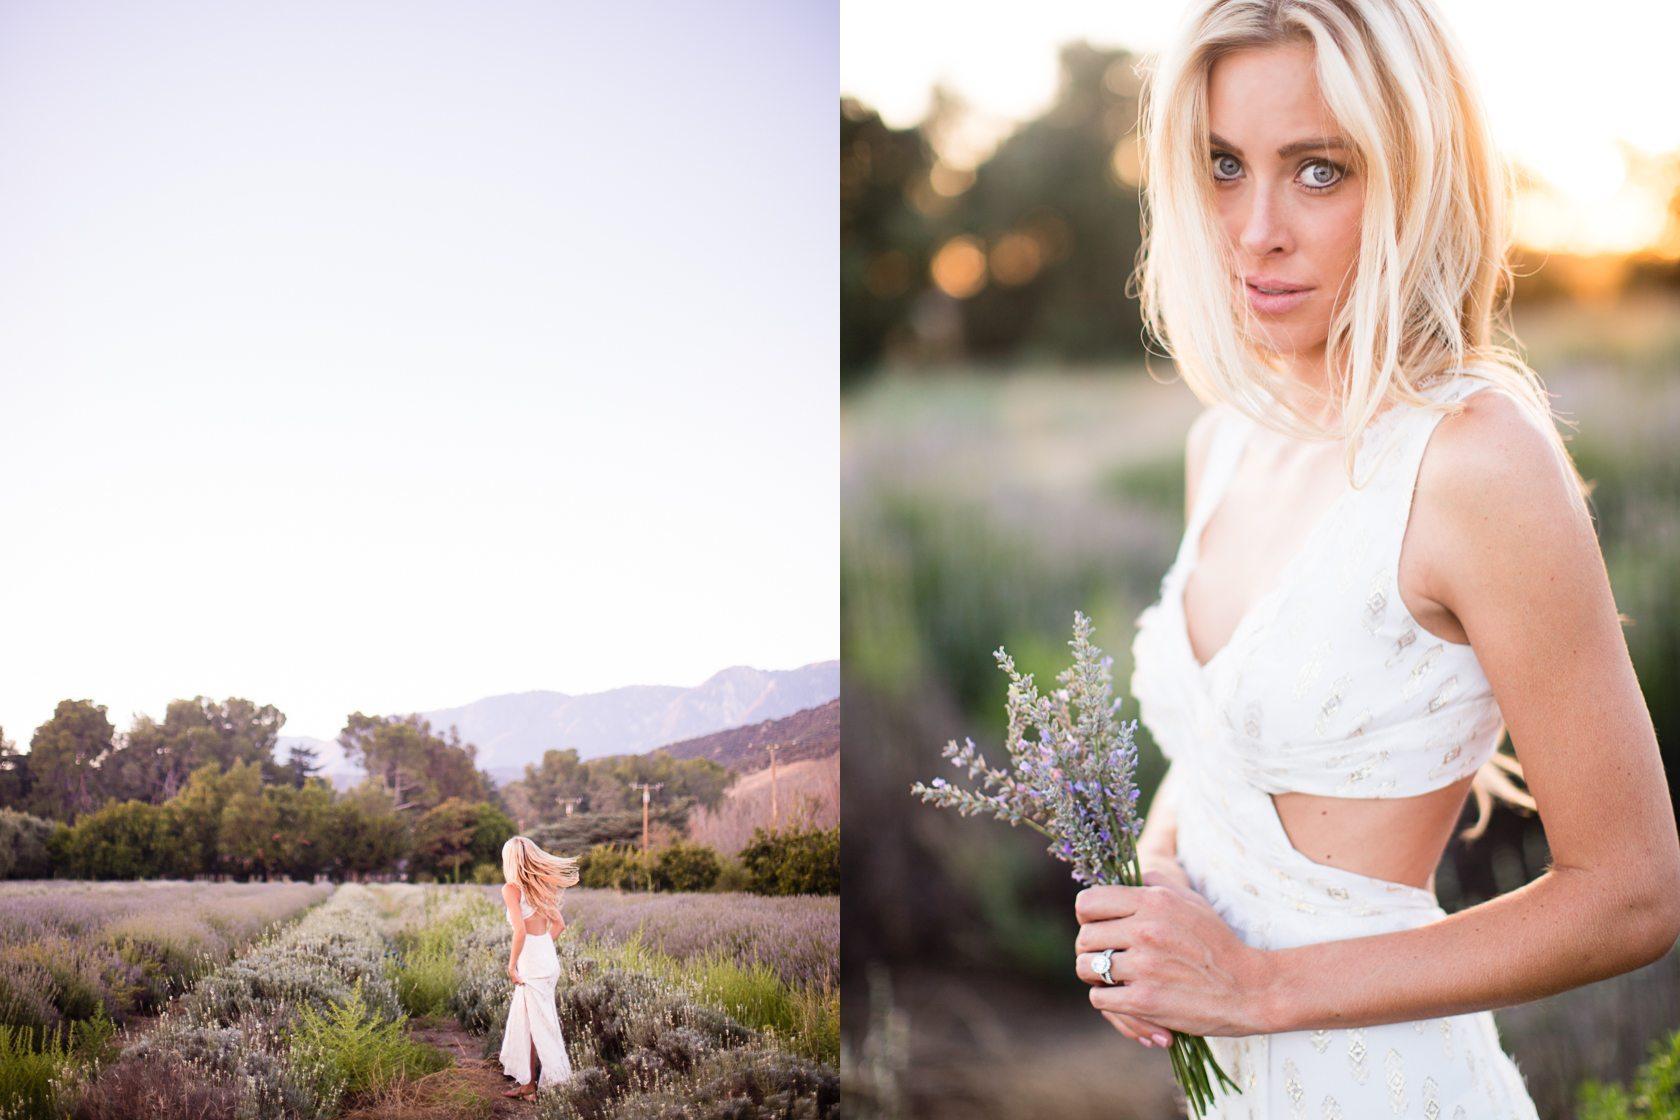 Highland_Springs_Lavender_Field_Engagement_02.jpg